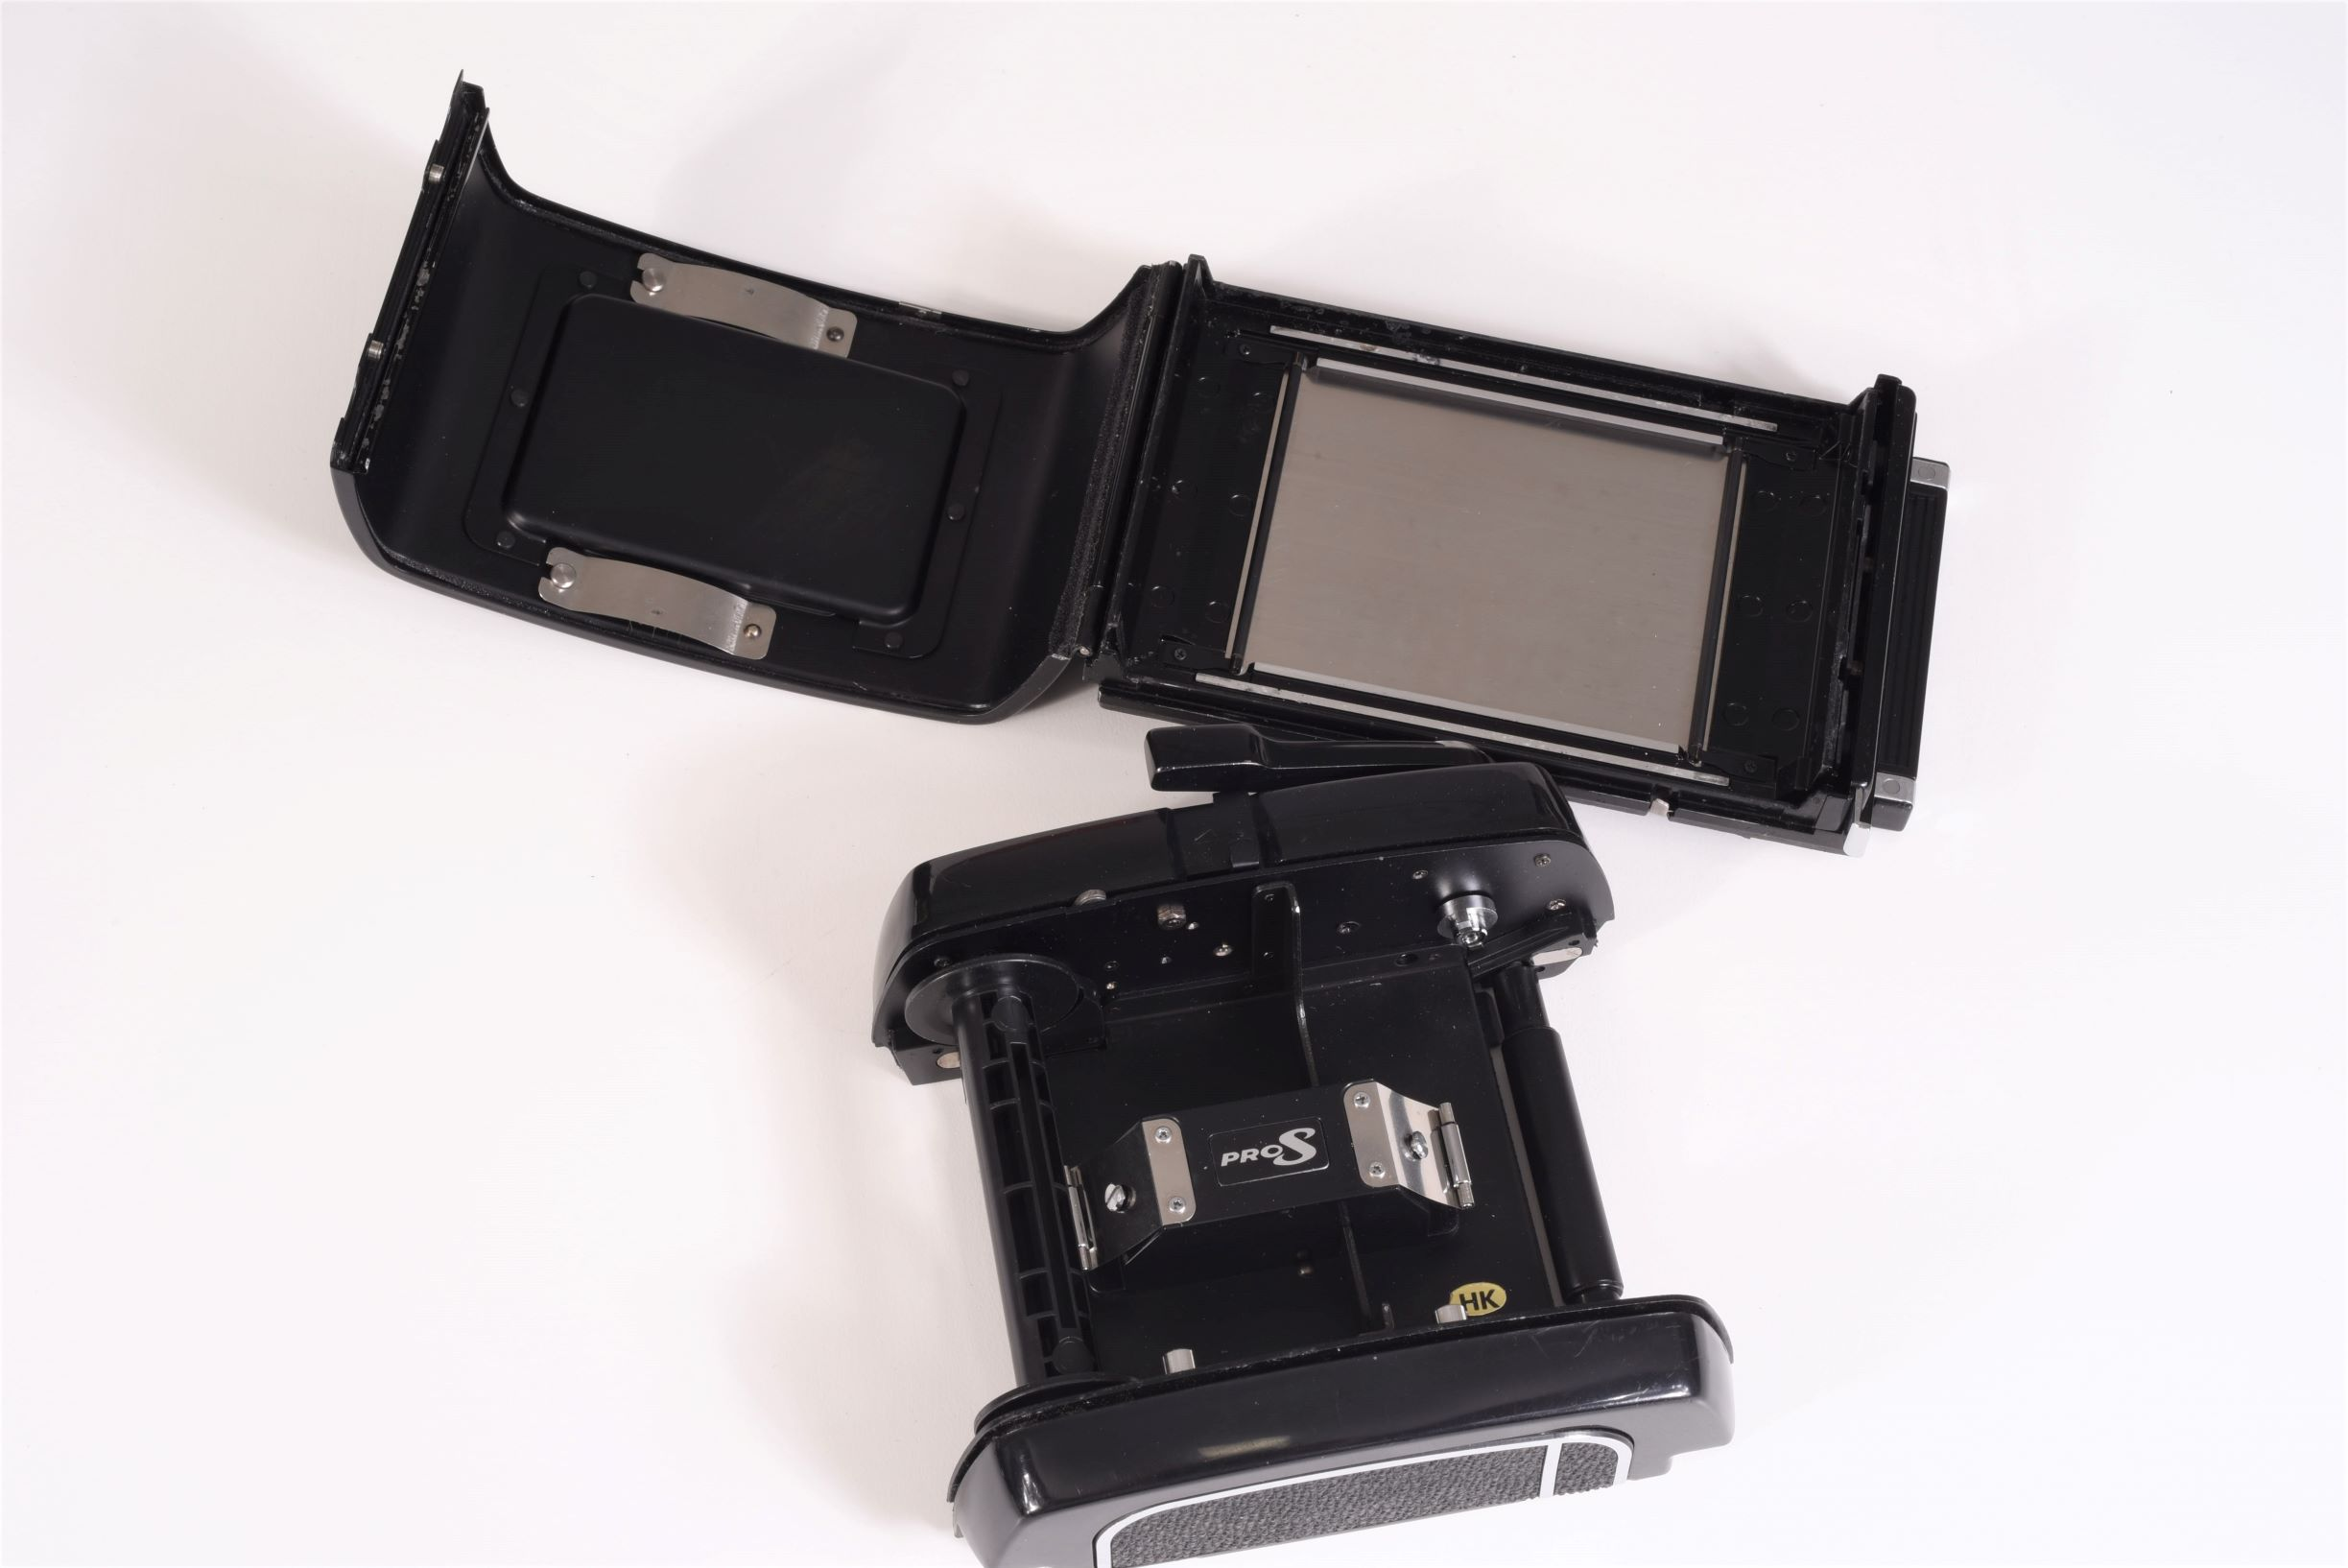 Mamiya RB67 Pro S, 90 & 180 mm lenses, WLF, back, extension